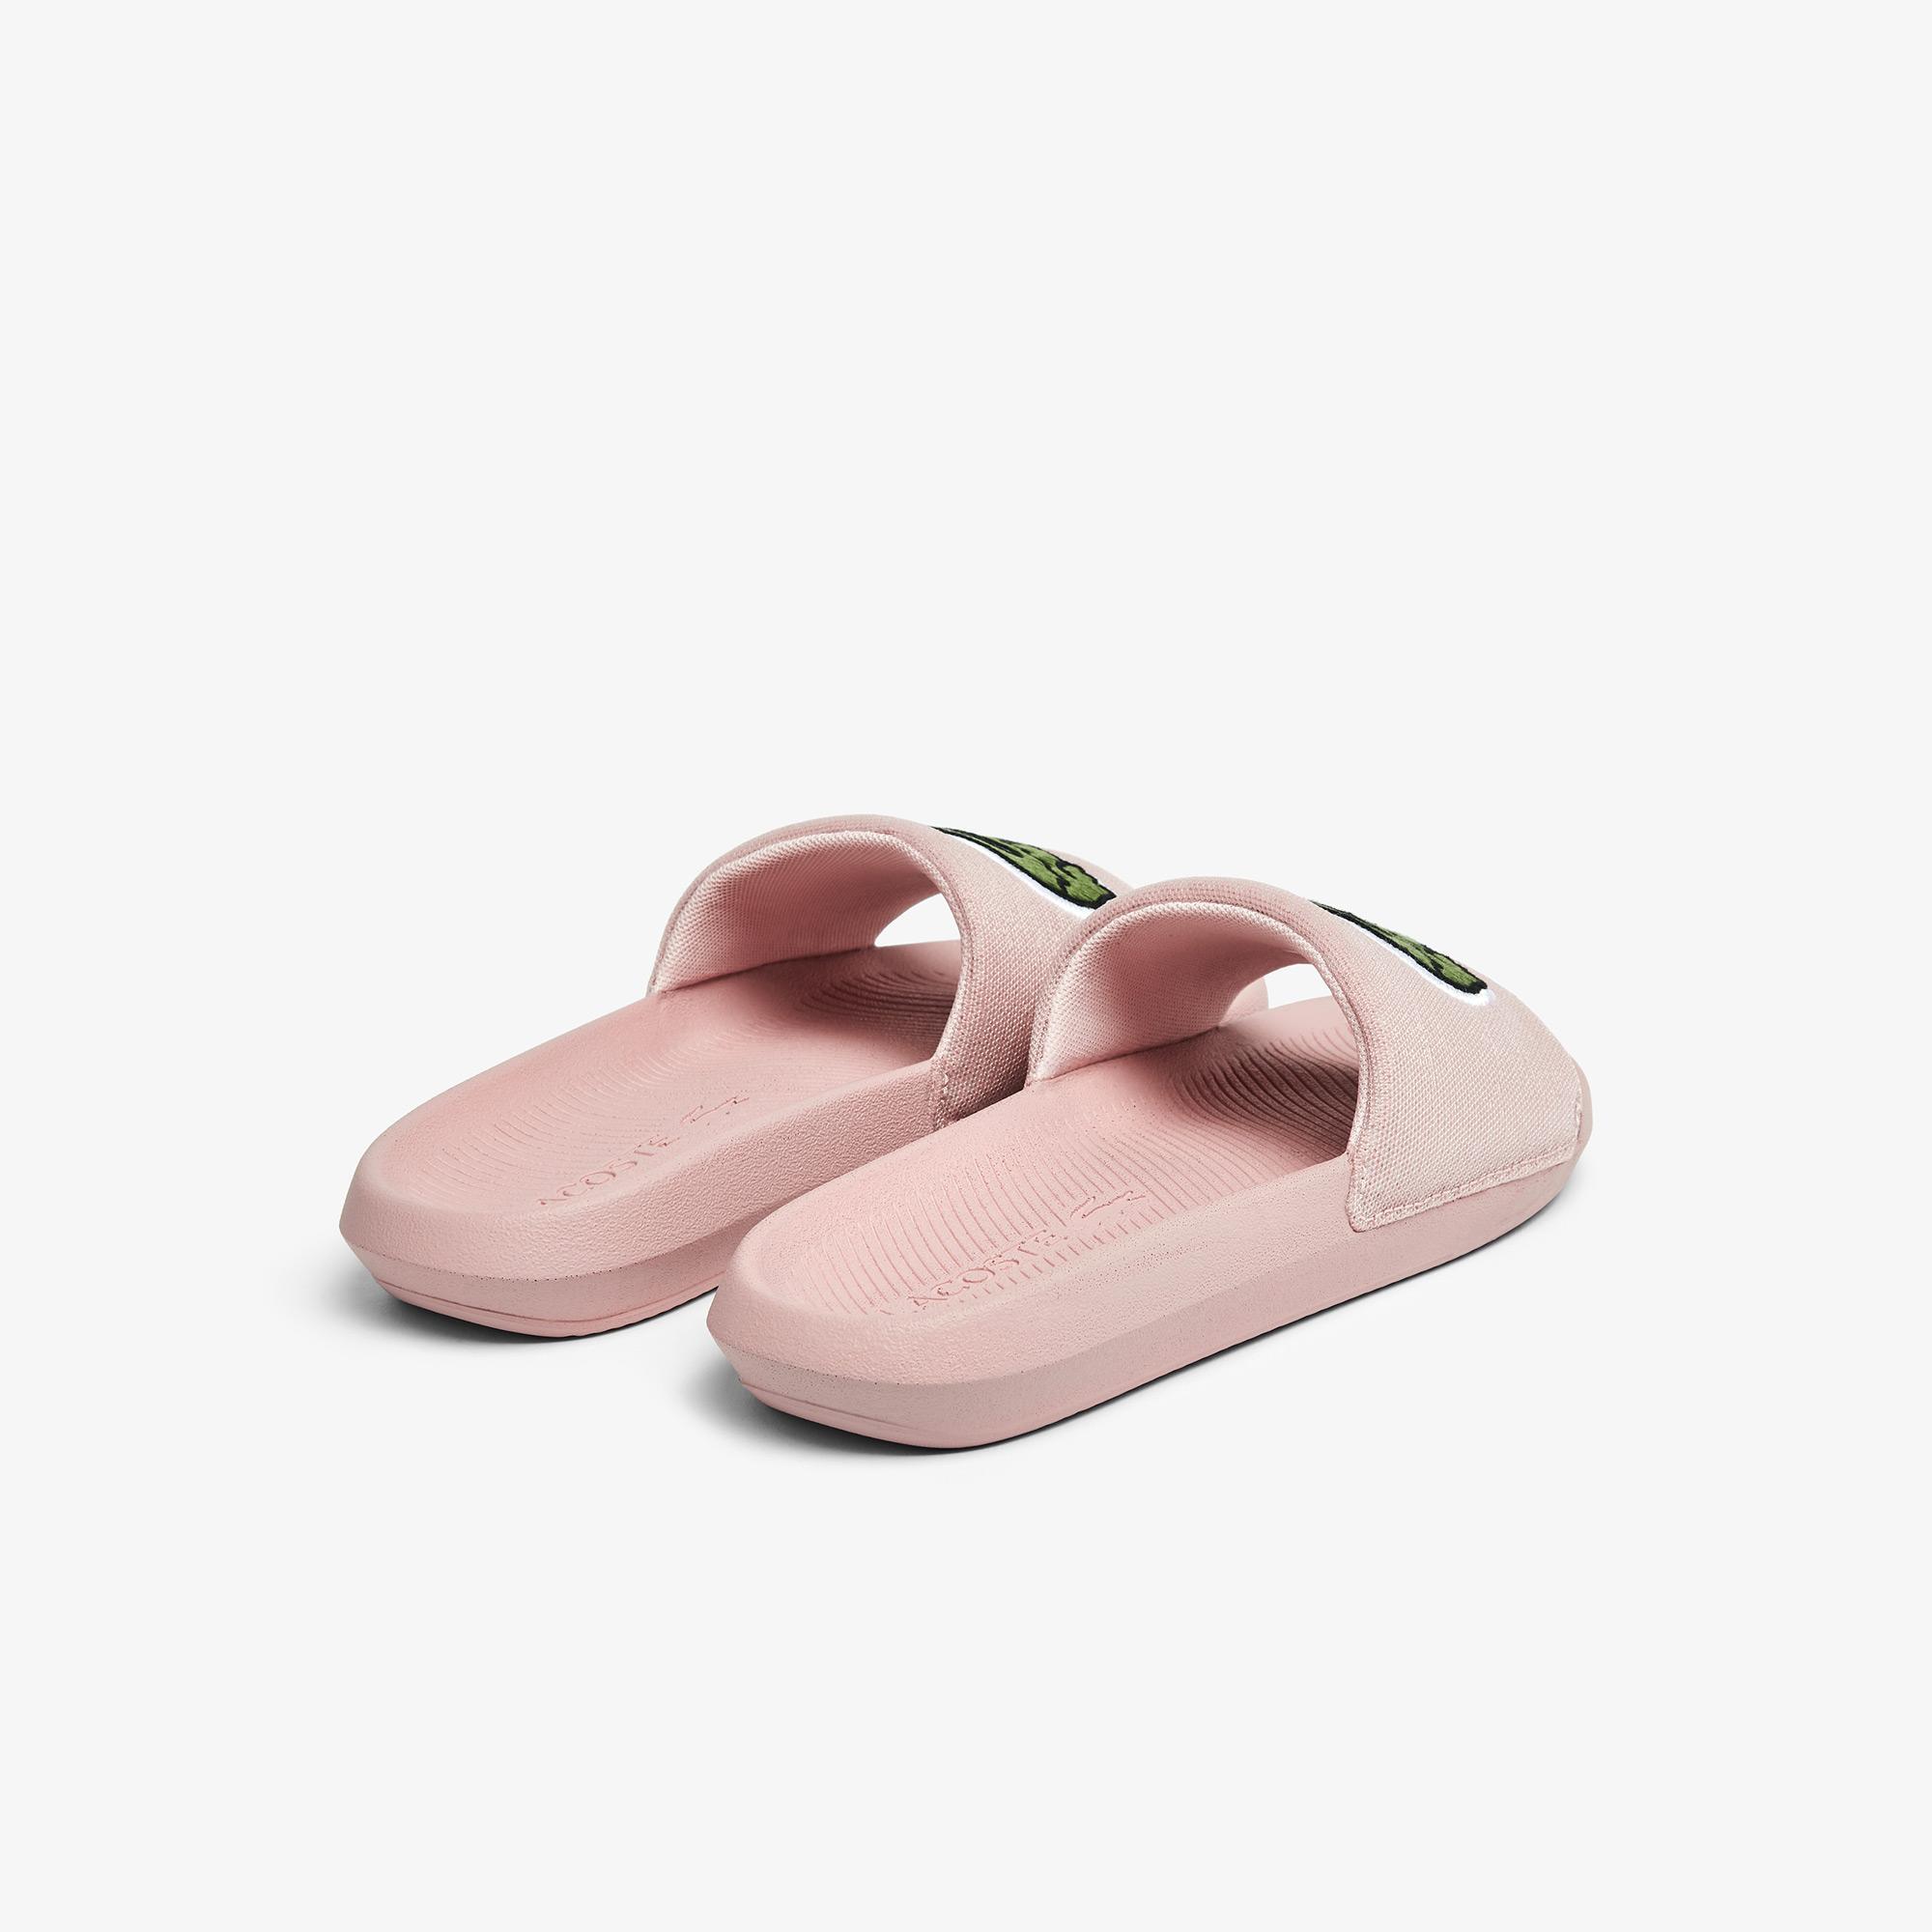 Lacoste Women's Croco Slıde 0921 1 Cfa Shoes